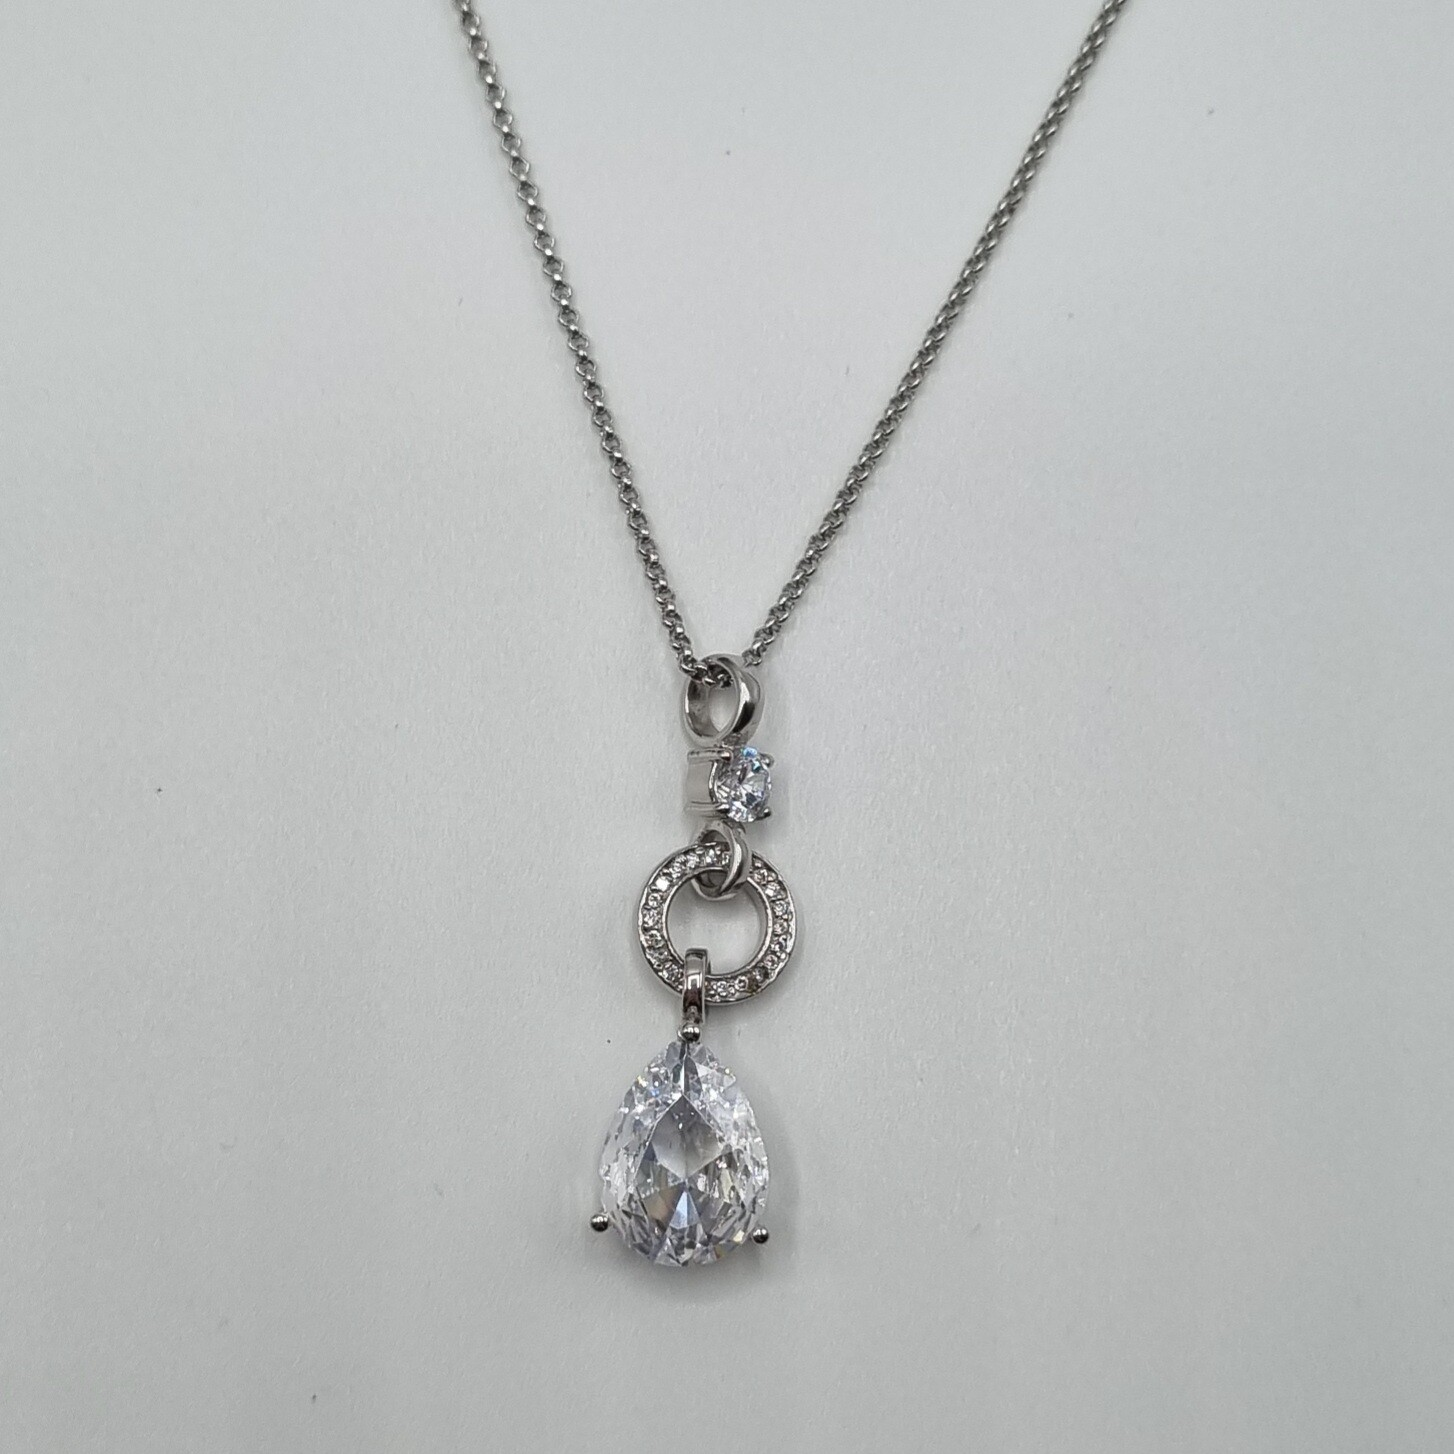 Collier Silber